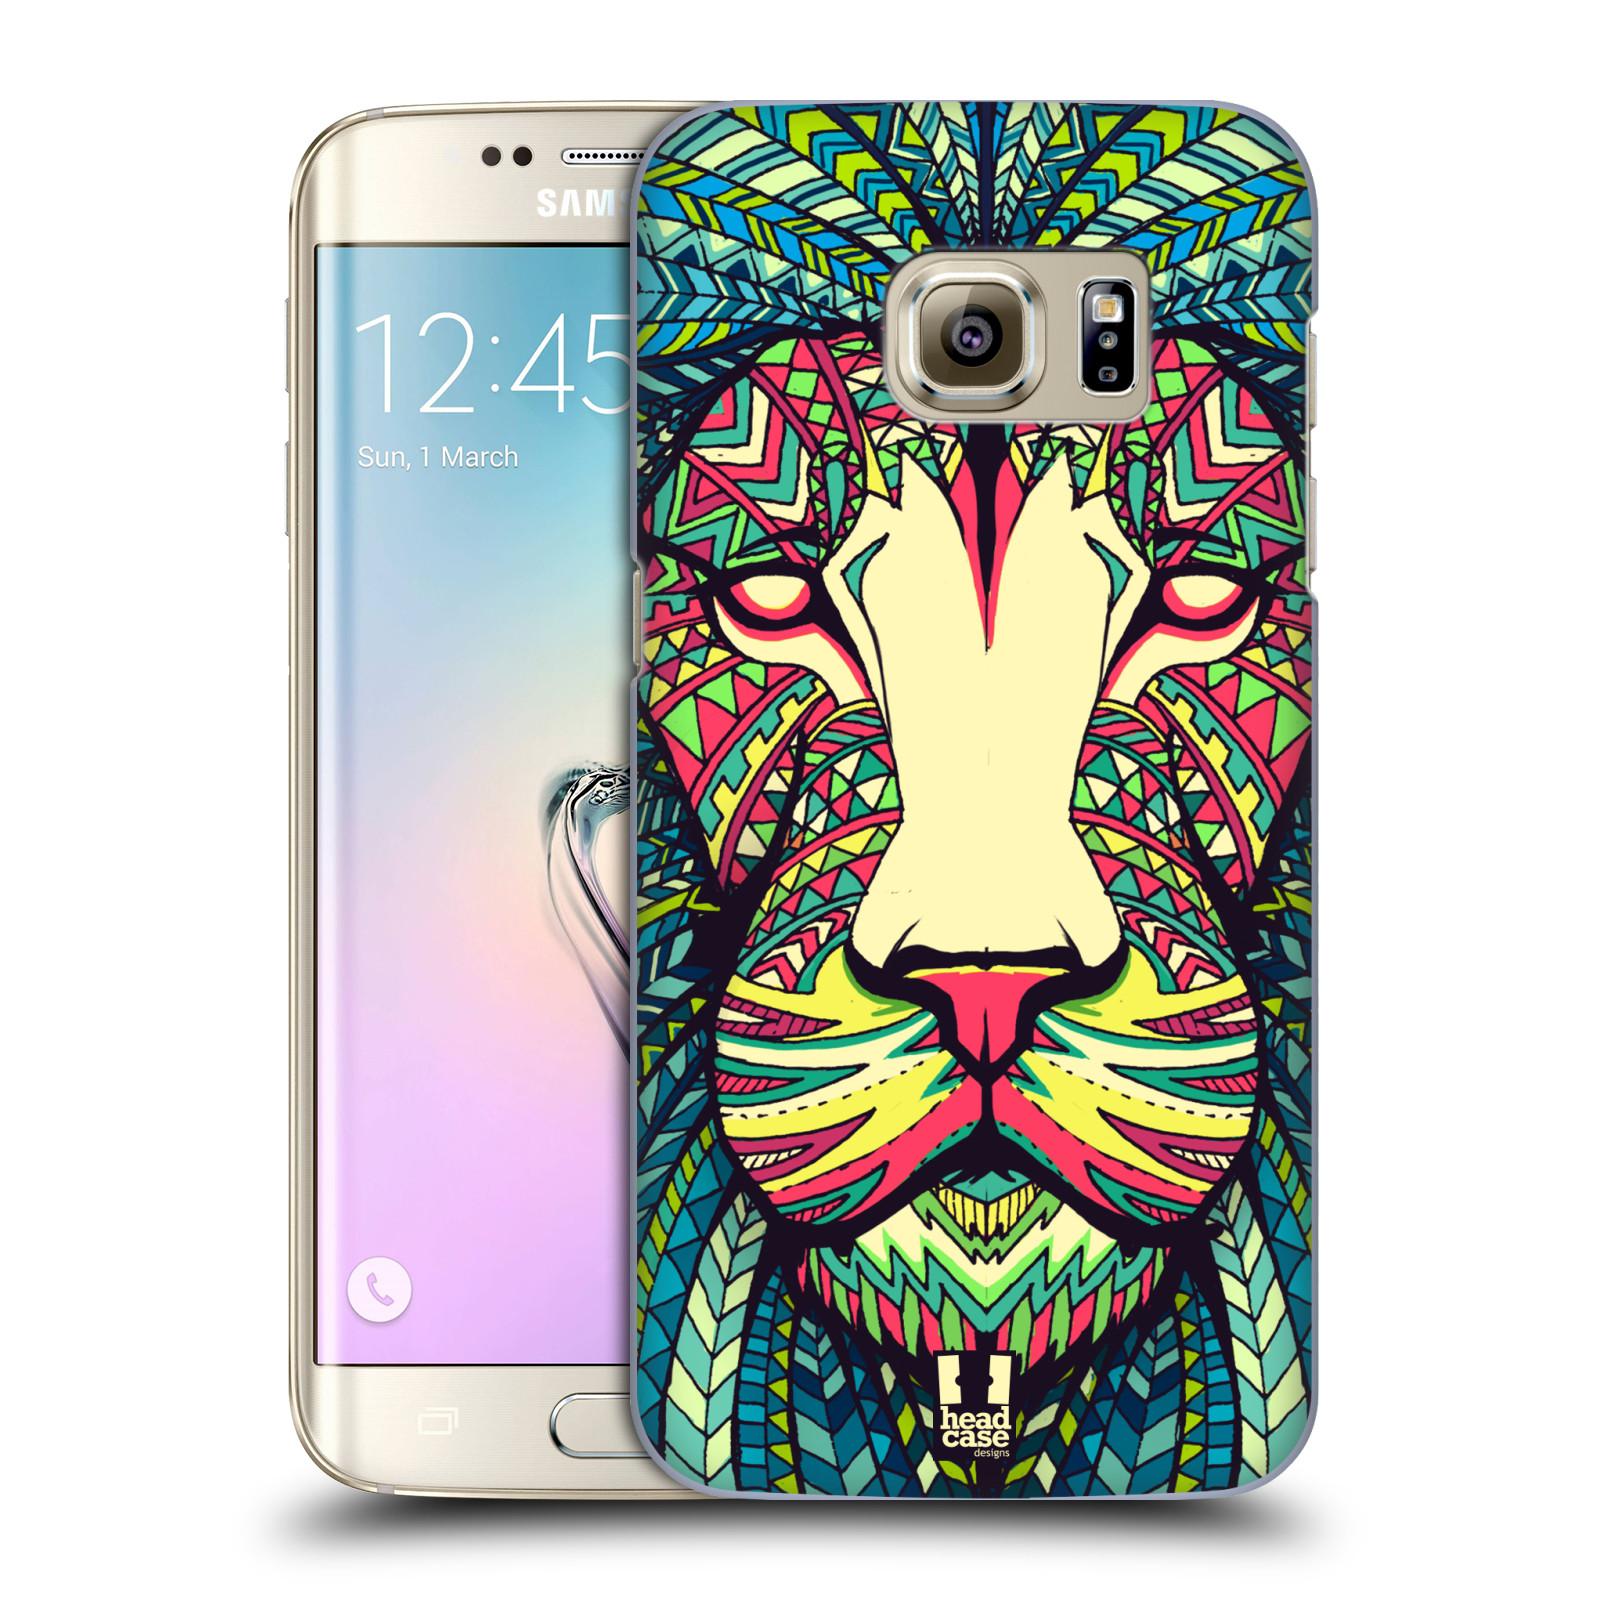 HEAD CASE plastový obal na mobil SAMSUNG GALAXY S7 EDGE vzor Aztécký motiv zvíře lev